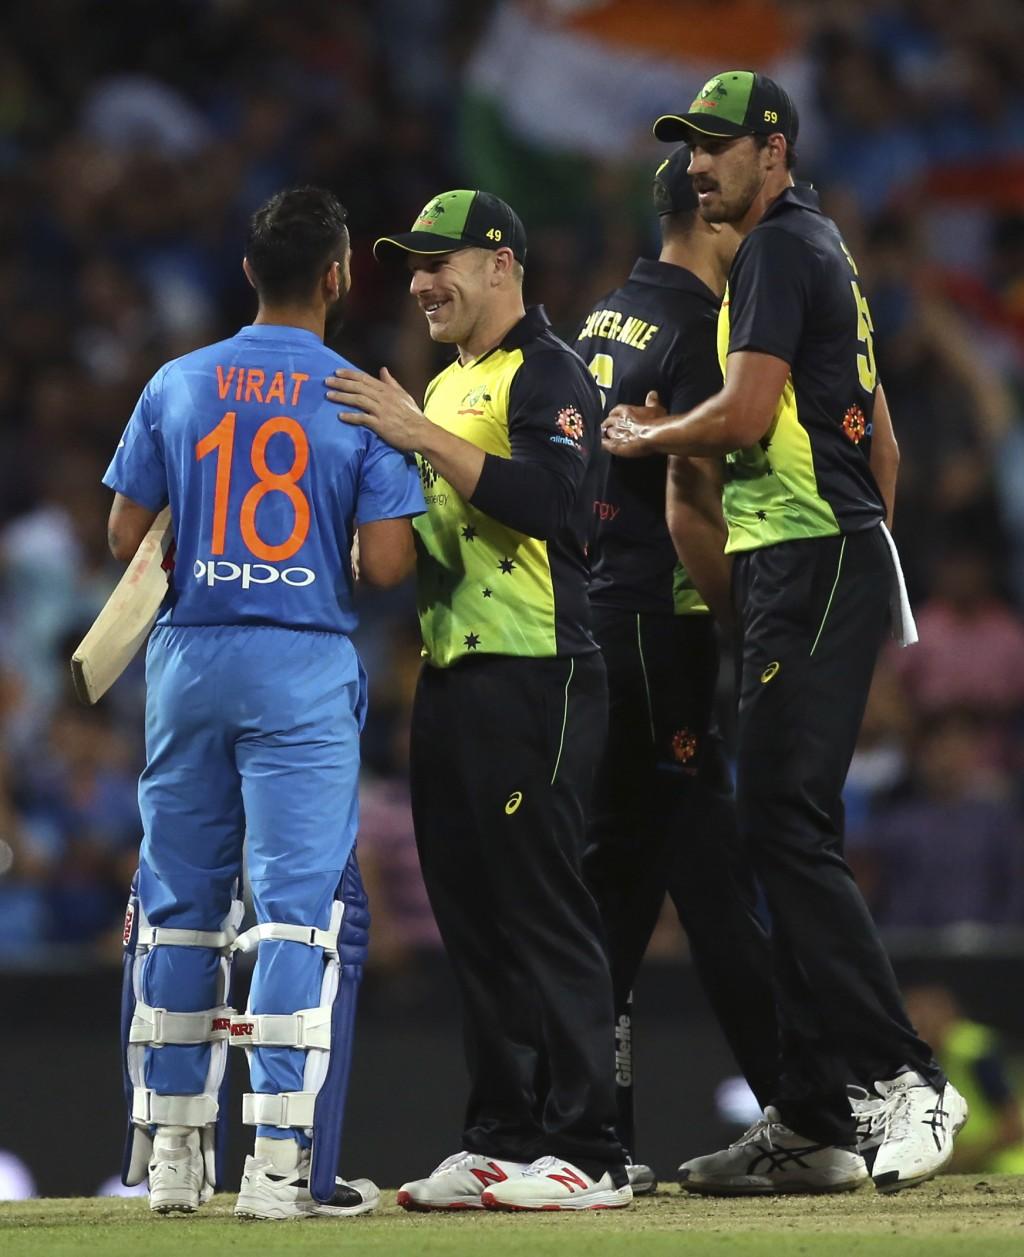 India's Virhat Kohli, left, is congratulated by Australia's captain Aaron Finch after winning their Twenty20 cricket match in Sydney, Sunday, Nov. 25,